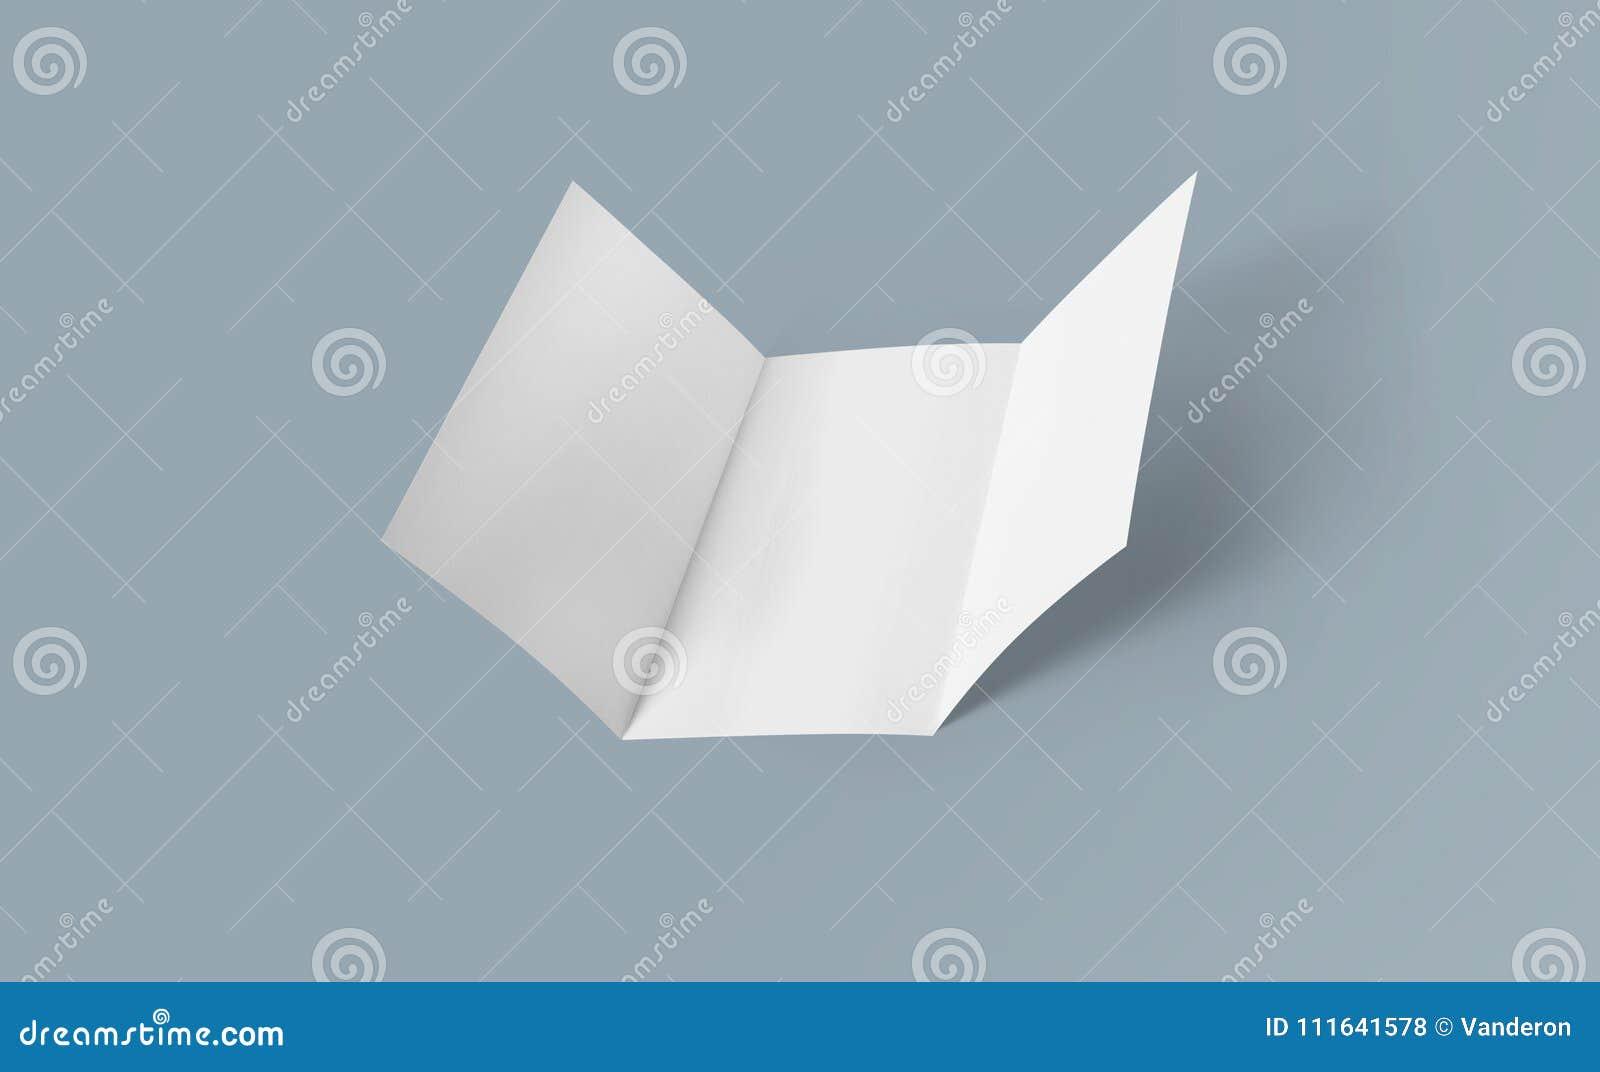 tri fold brochure mock up blank brochure white template paper on